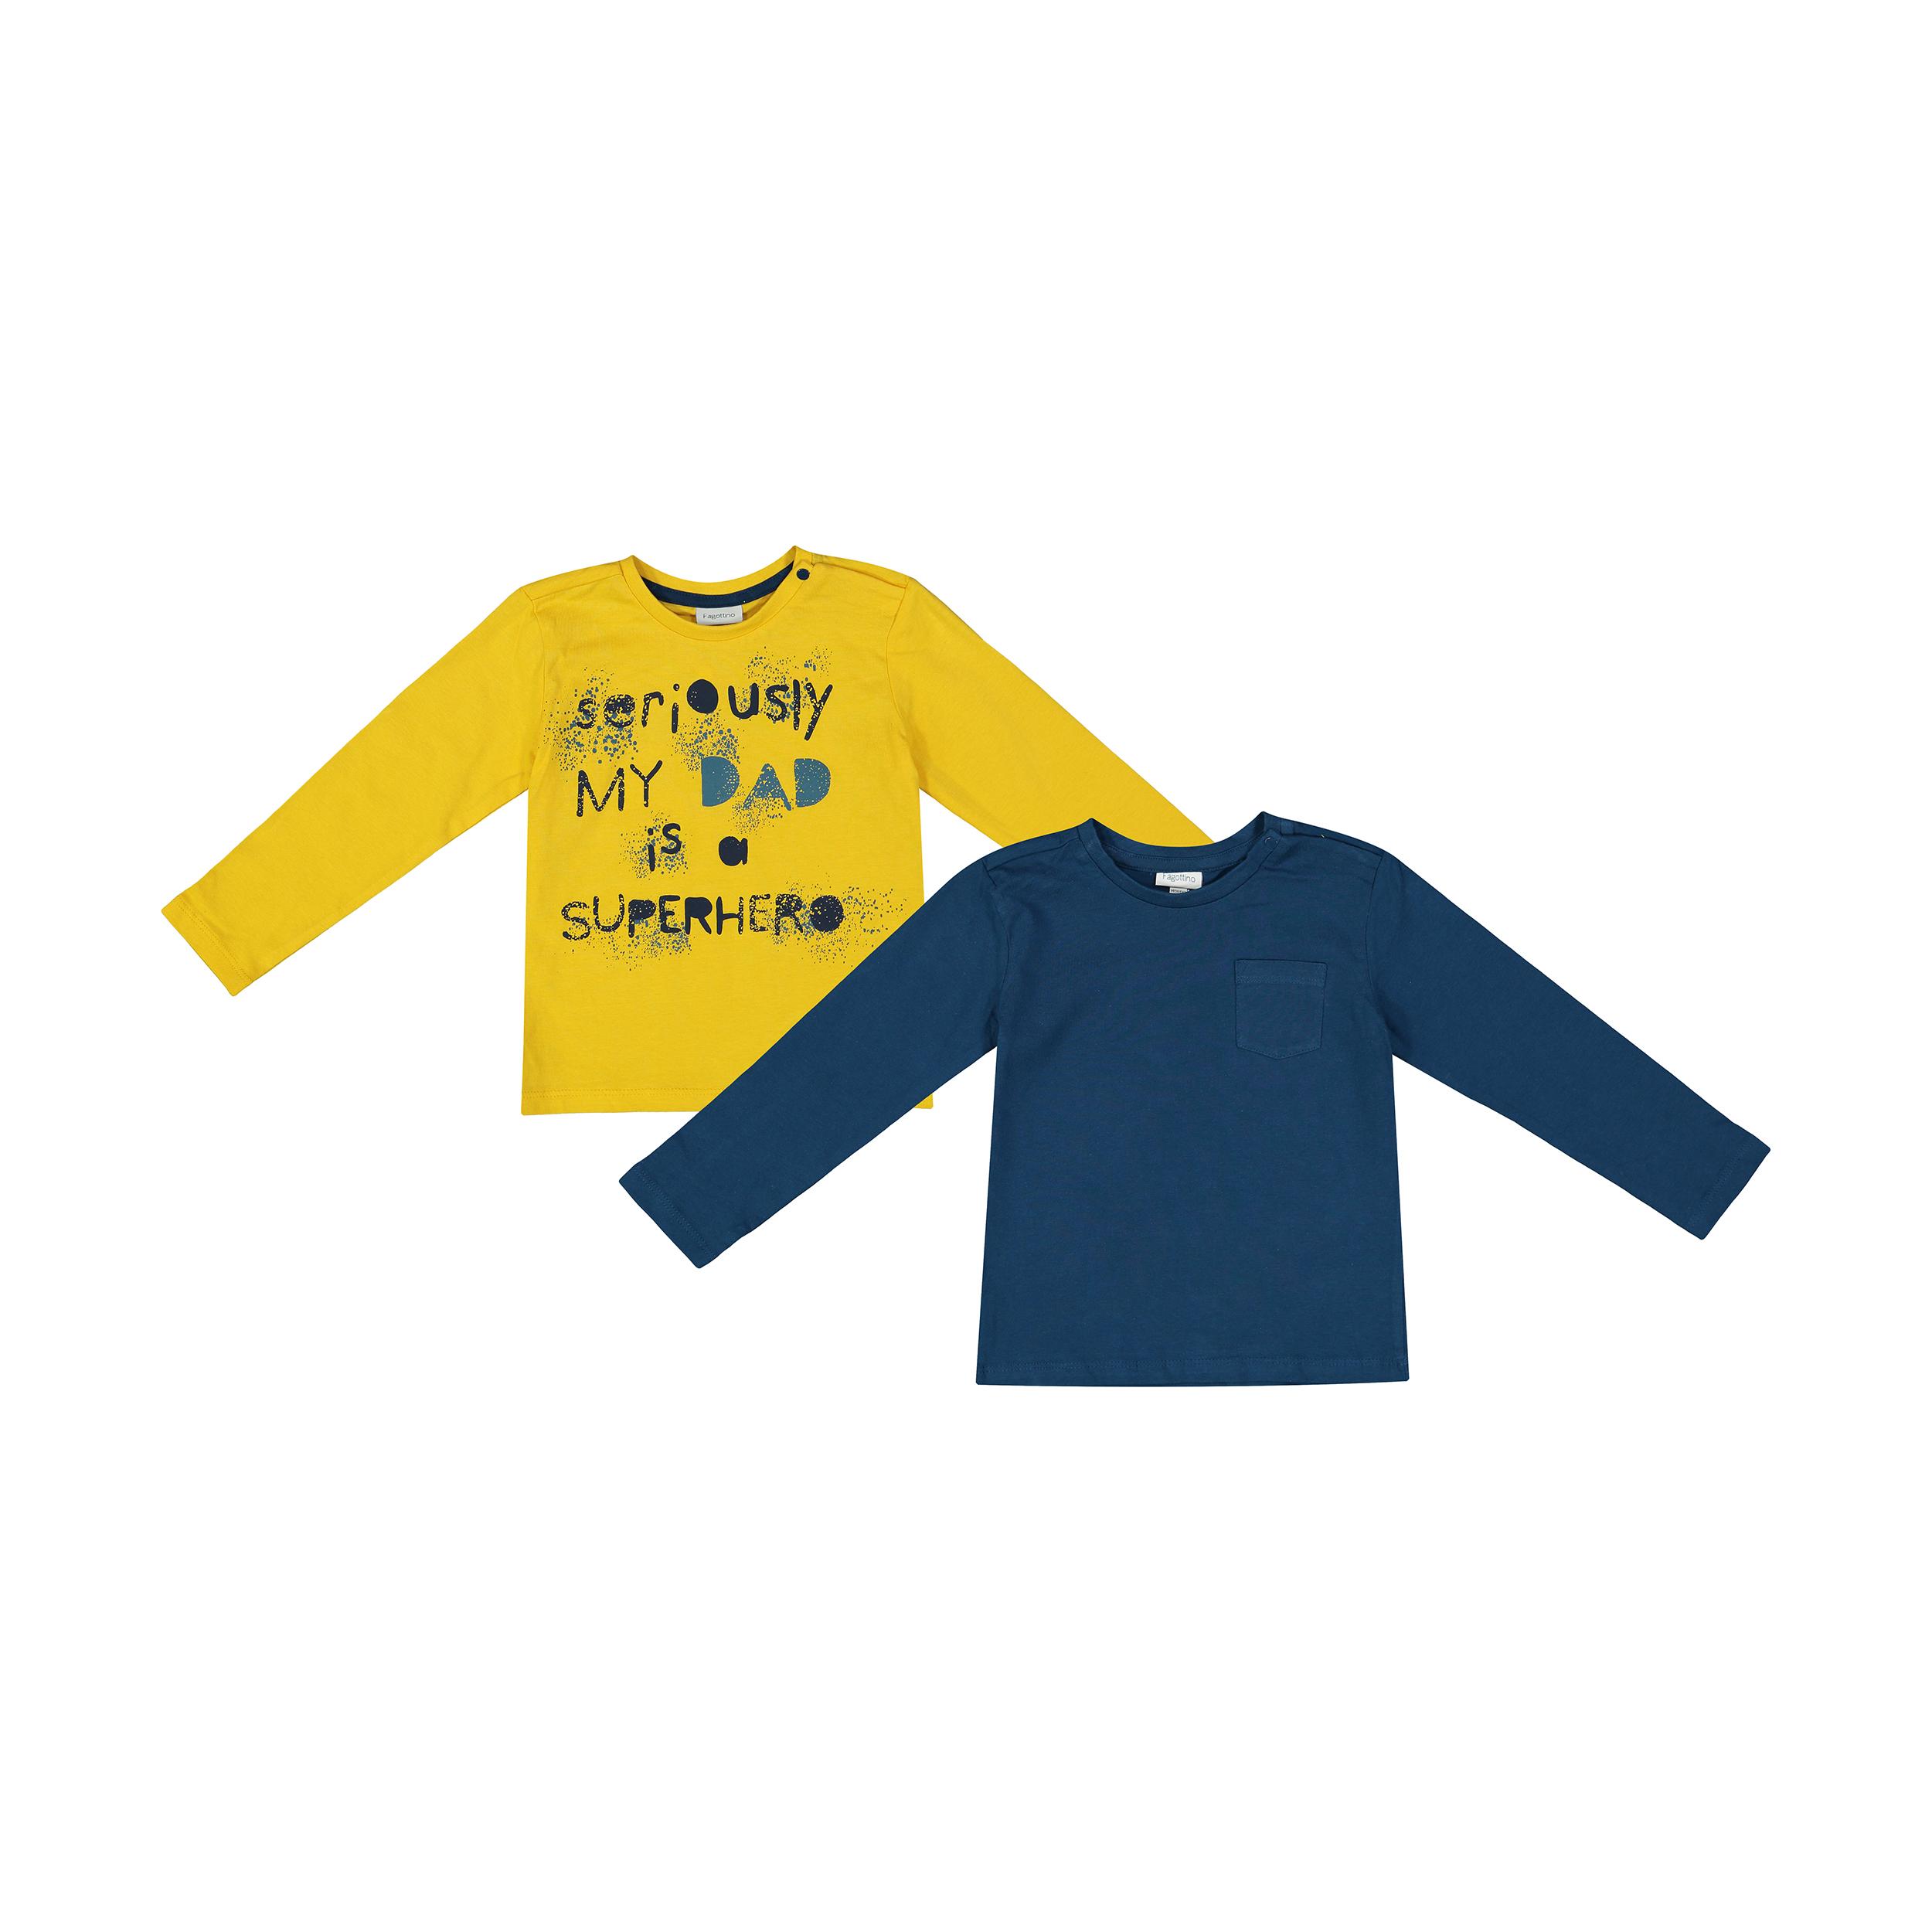 تی شرت نوزادی او وی اس مدل 2414616 بسته 2 عددی